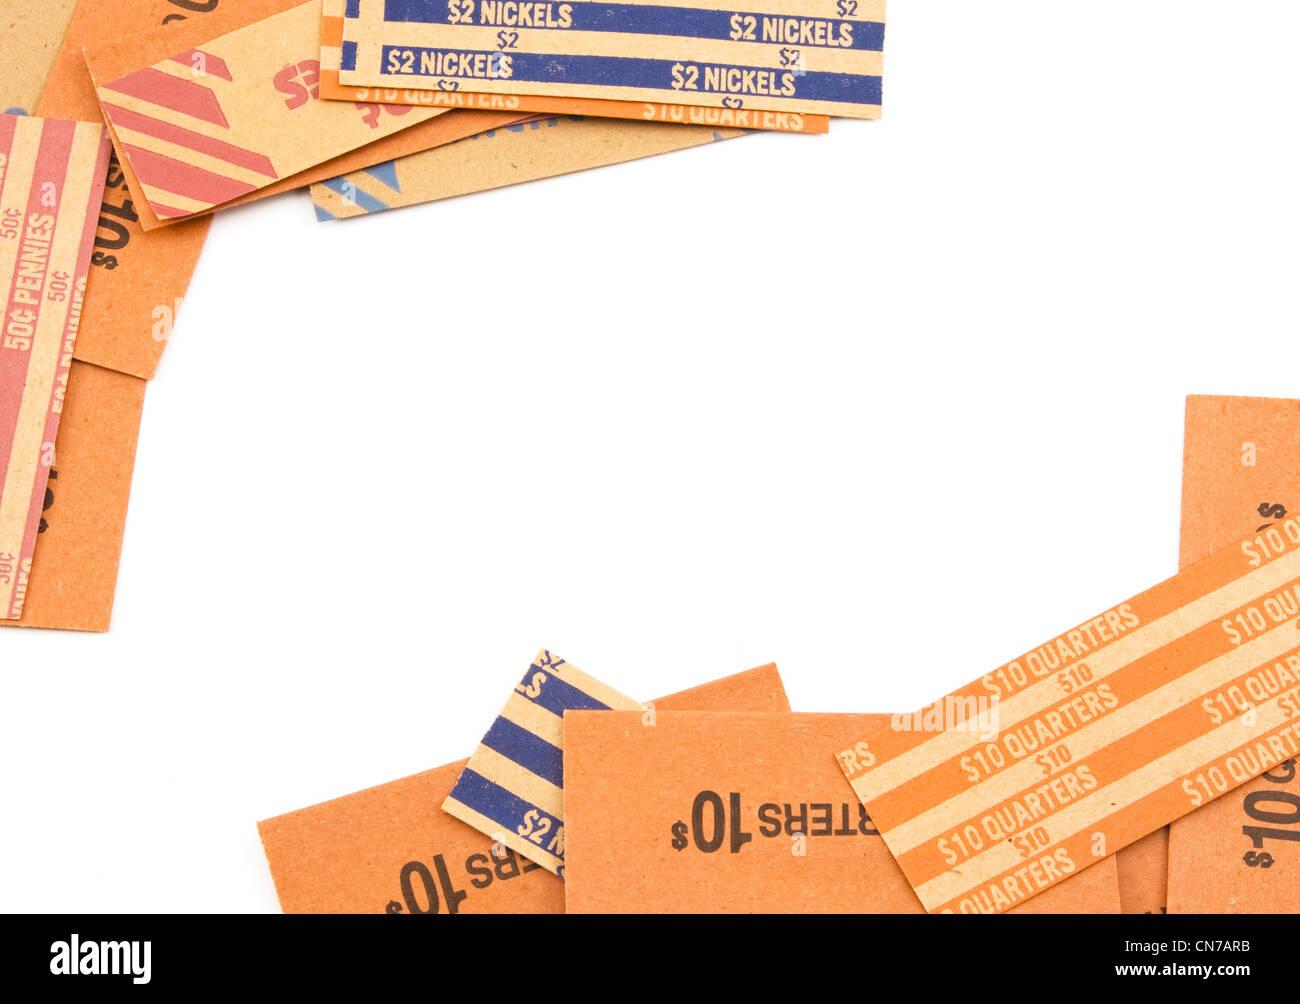 Coin Roll Stockfotos & Coin Roll Bilder - Alamy